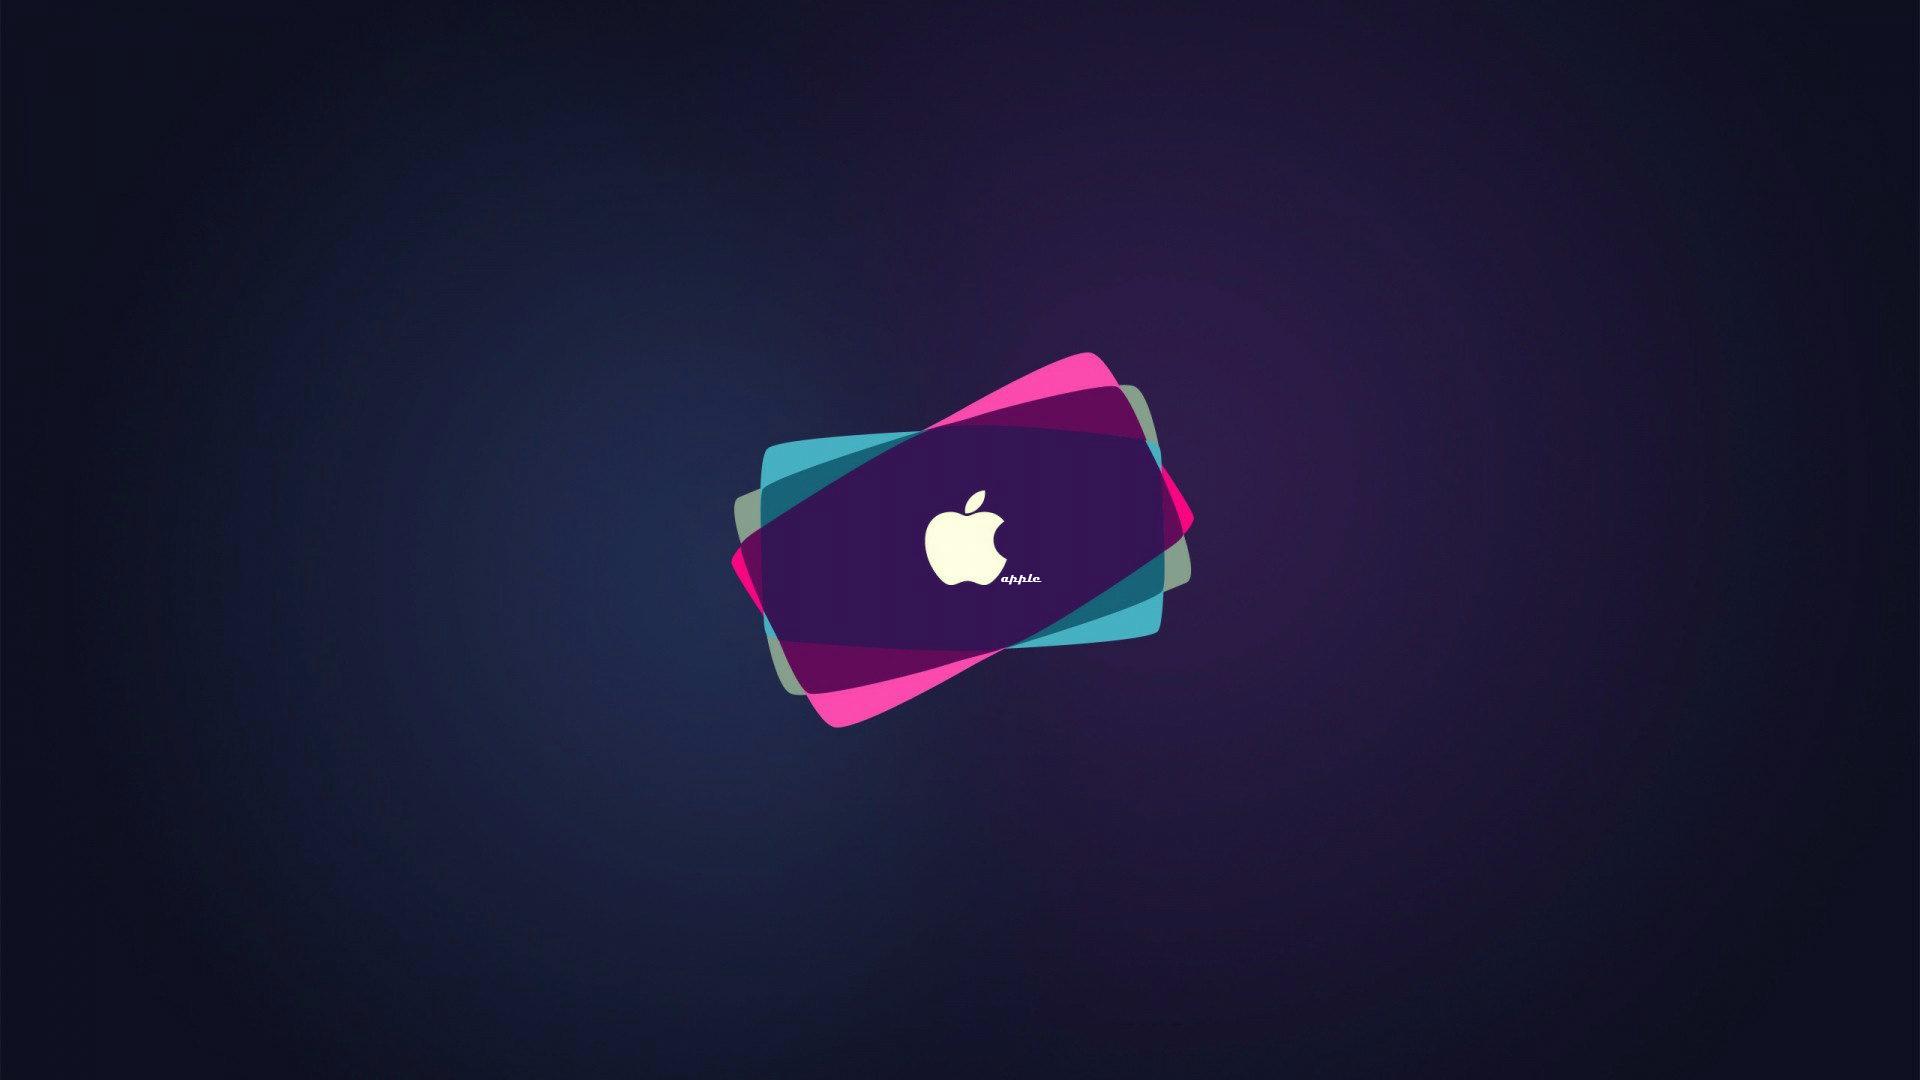 Hd Wallpapers For Mac P Wallpapersink Cool Animated Desktop